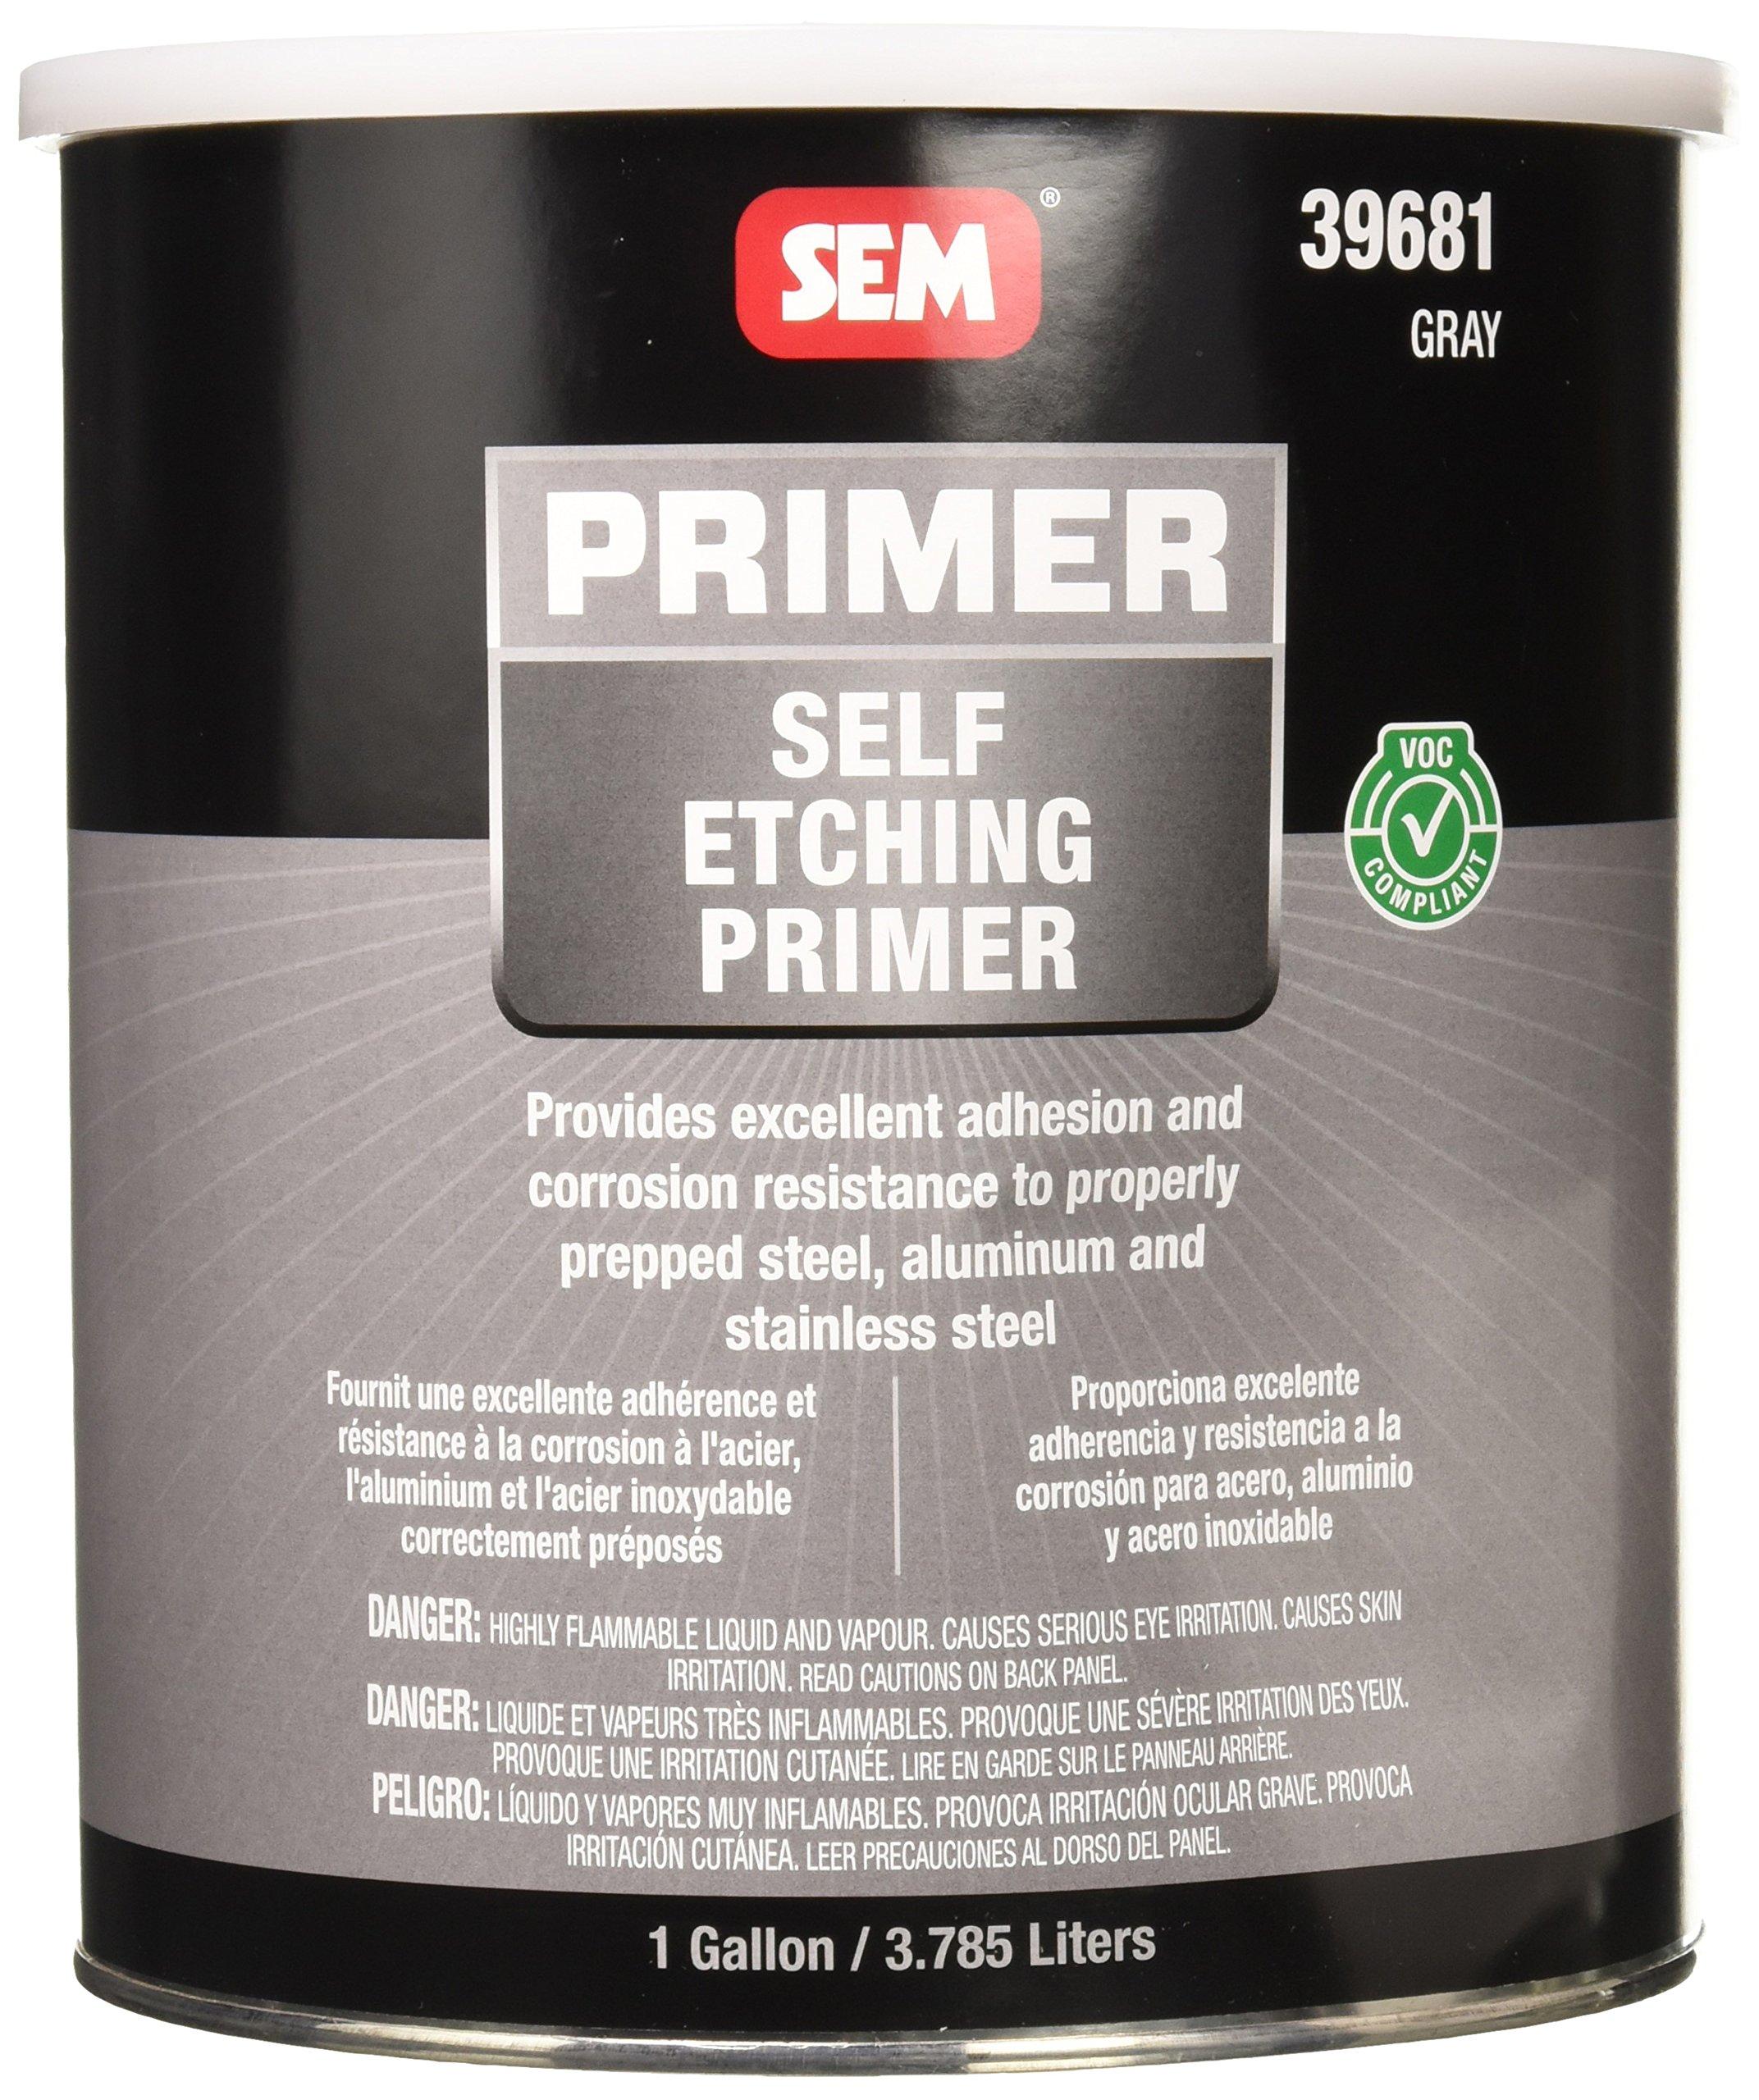 SEM 39681 VOC Grey Self Etching Primer - 1 Gallon